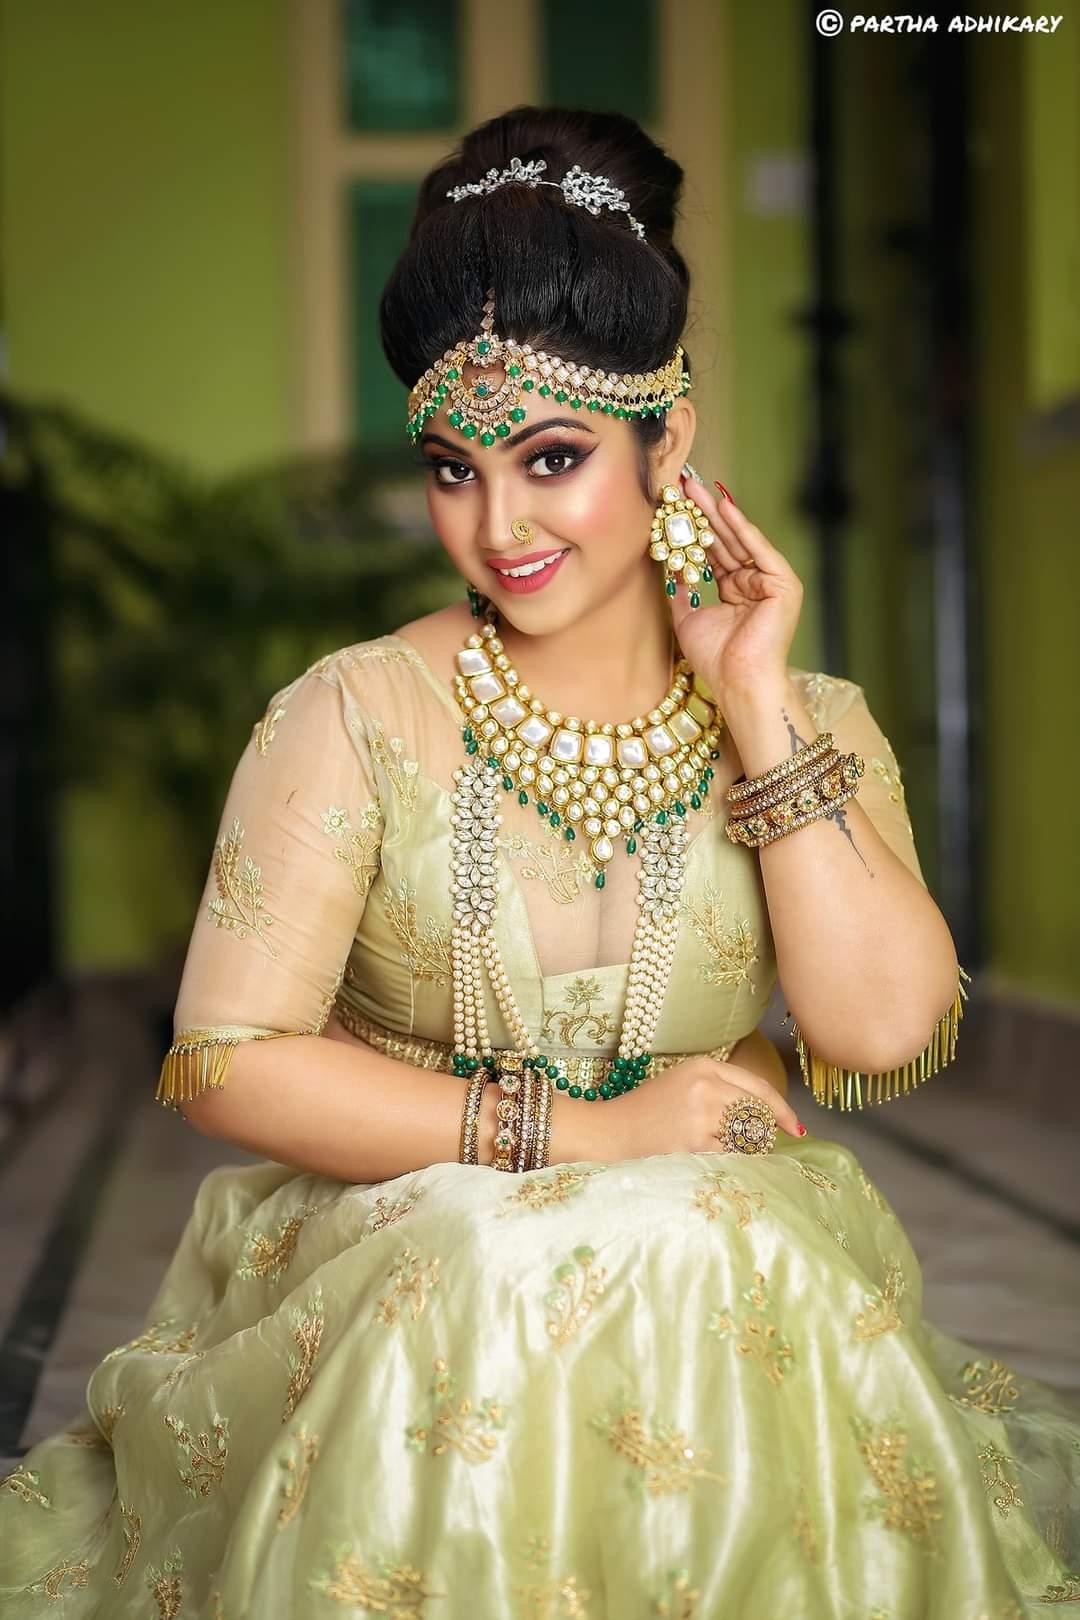 sudeshna-dasgupta-makeup-artist-bangalore